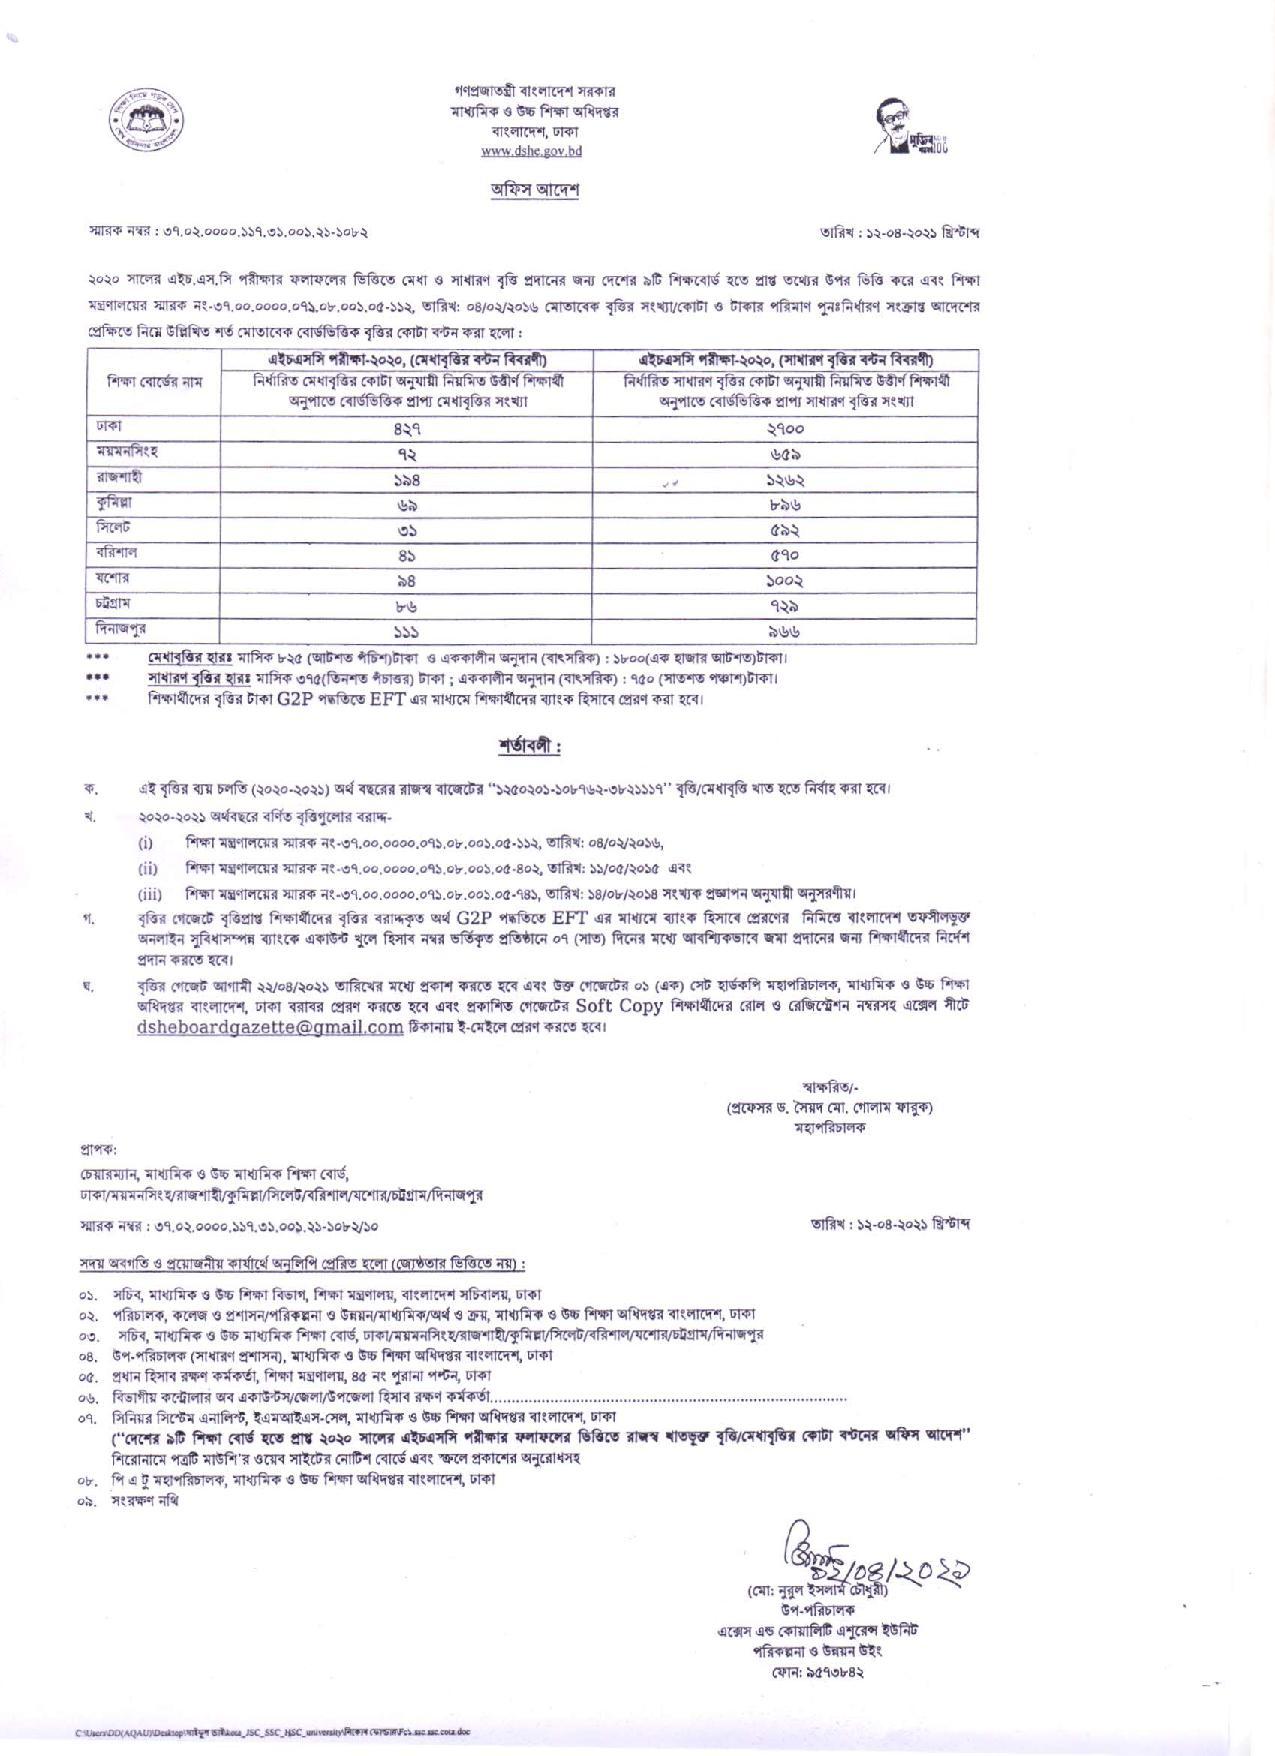 HSC Scholarship Result 2021 PDF - Download All Board Britti Result